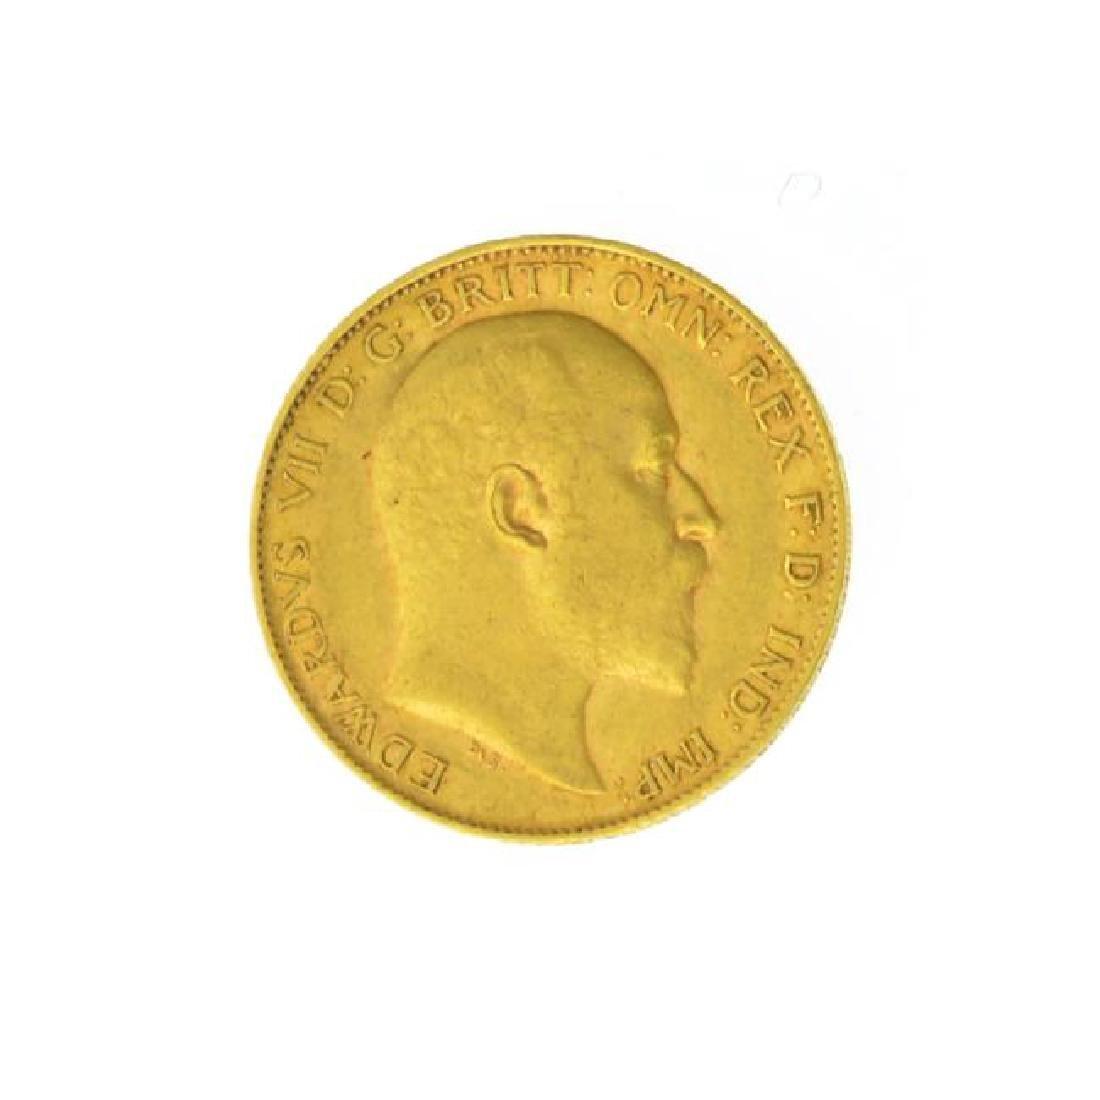 1902 British Half Sovereign Gold Coin (JG)